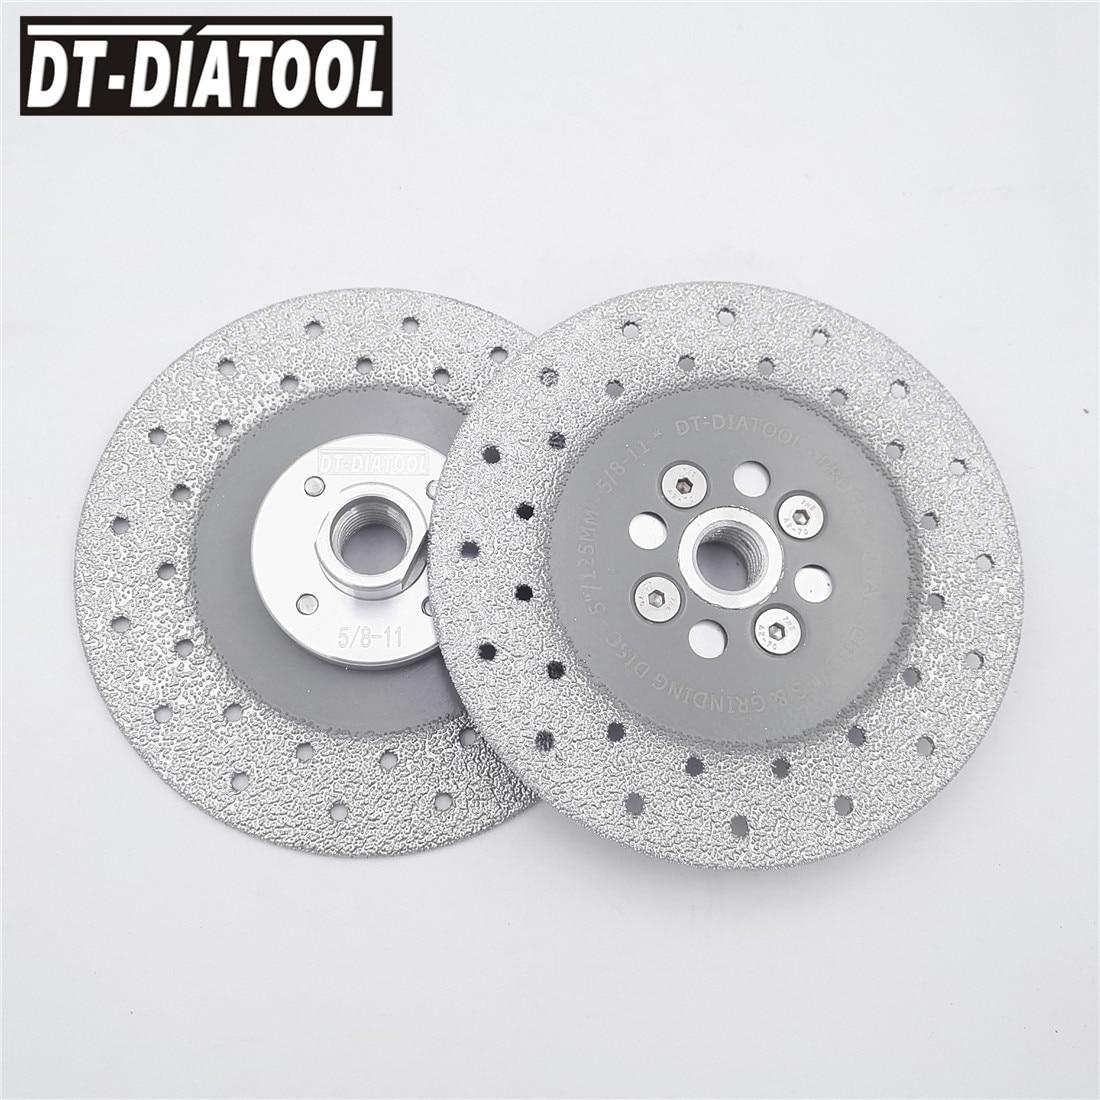 2pcs units 5 Double Sided Vacuum Brazed Diamond Cutting wheel Grinding Disc 5 8 11 Flange